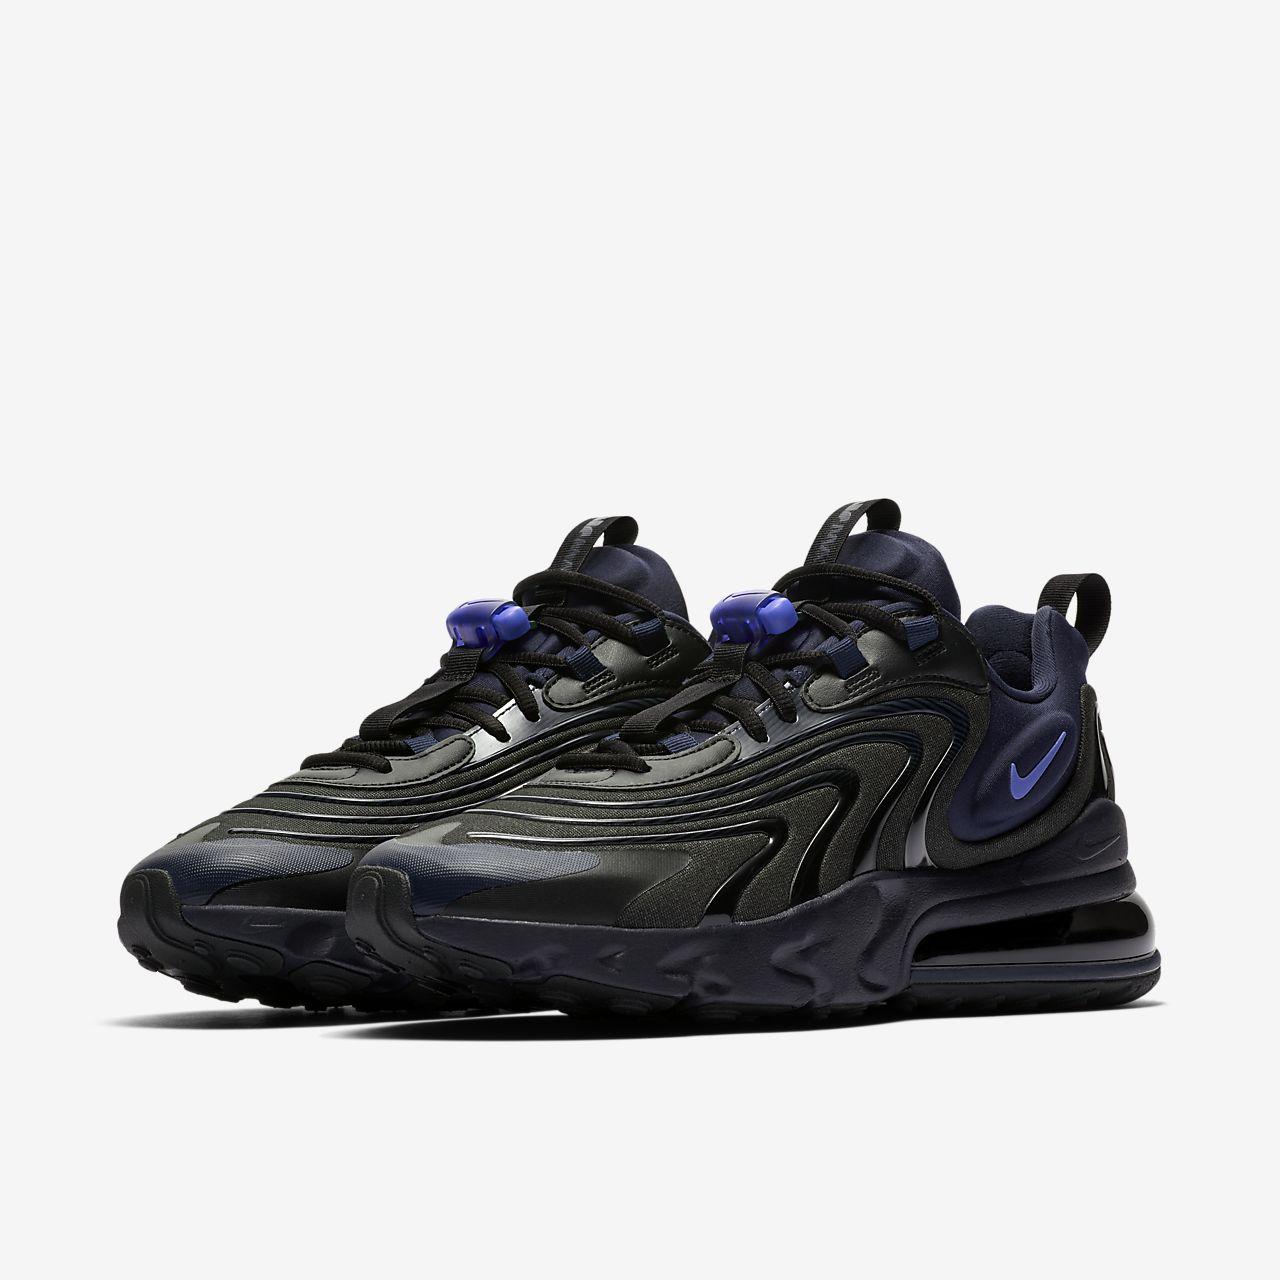 Nike Air Max 270 React ENG sko til mænd